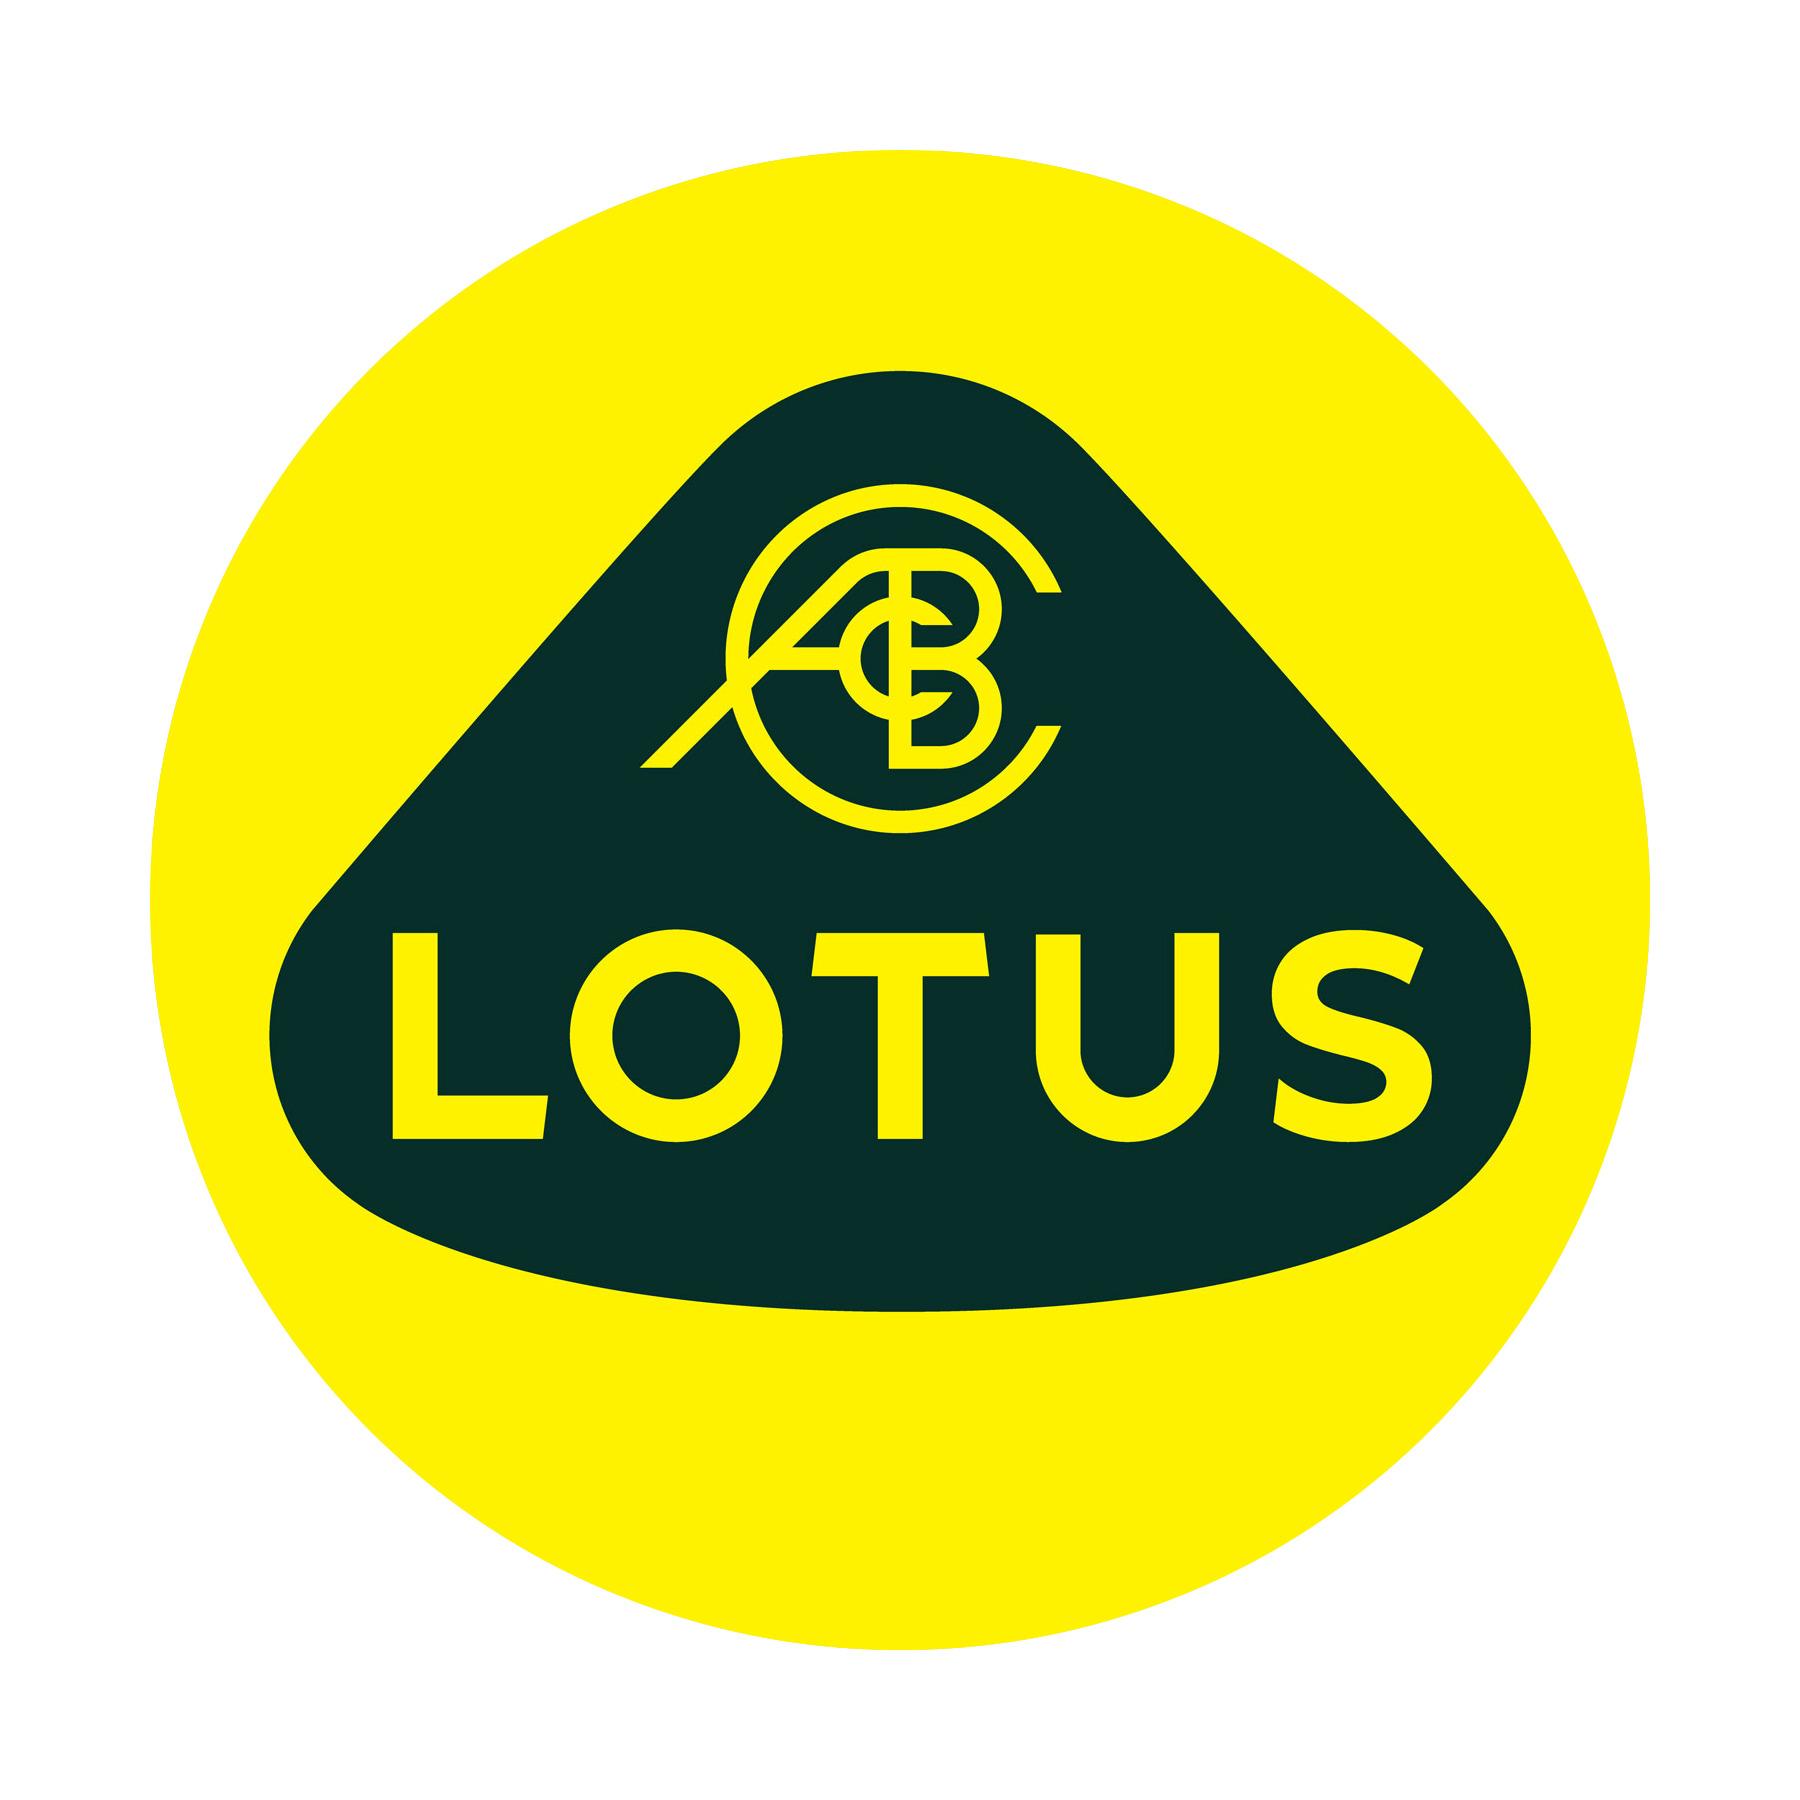 Imagen logo de Lotus